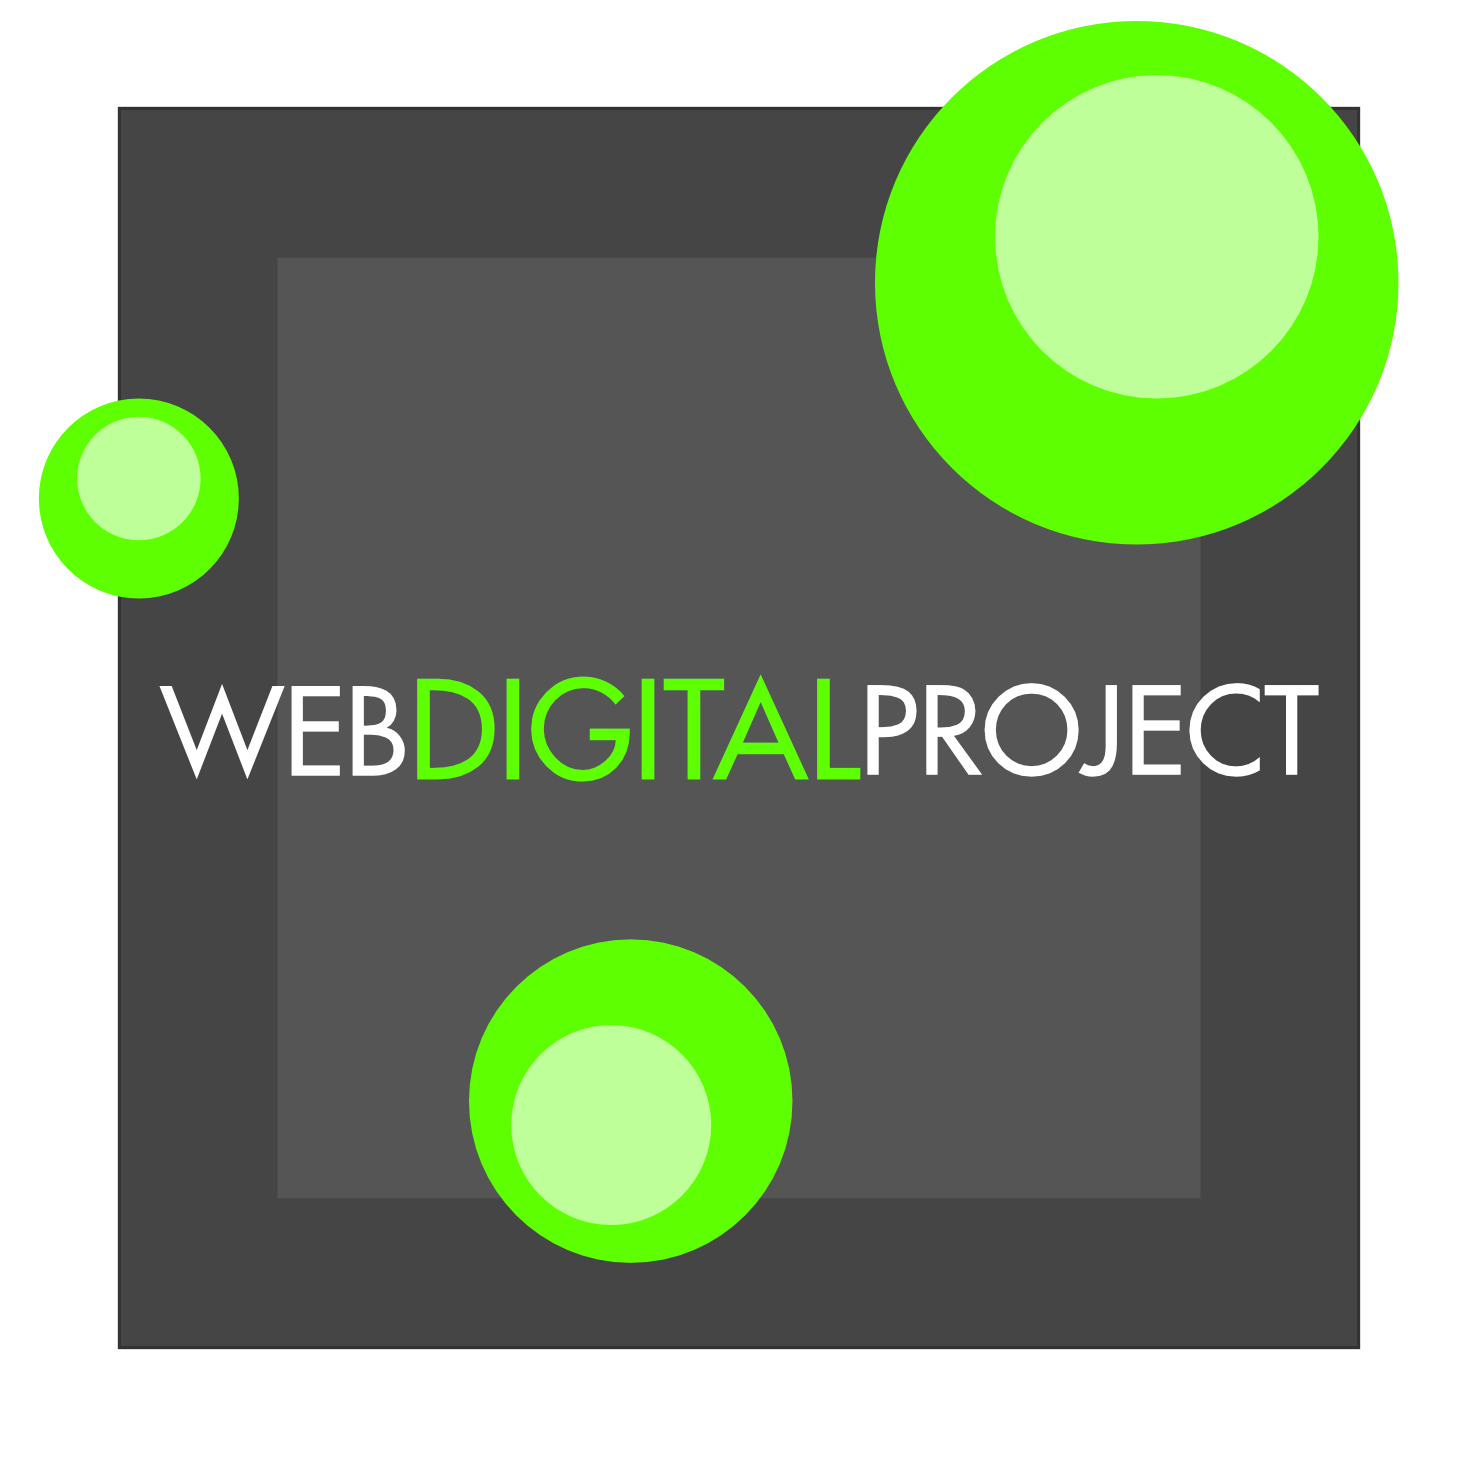 logo proposition edited